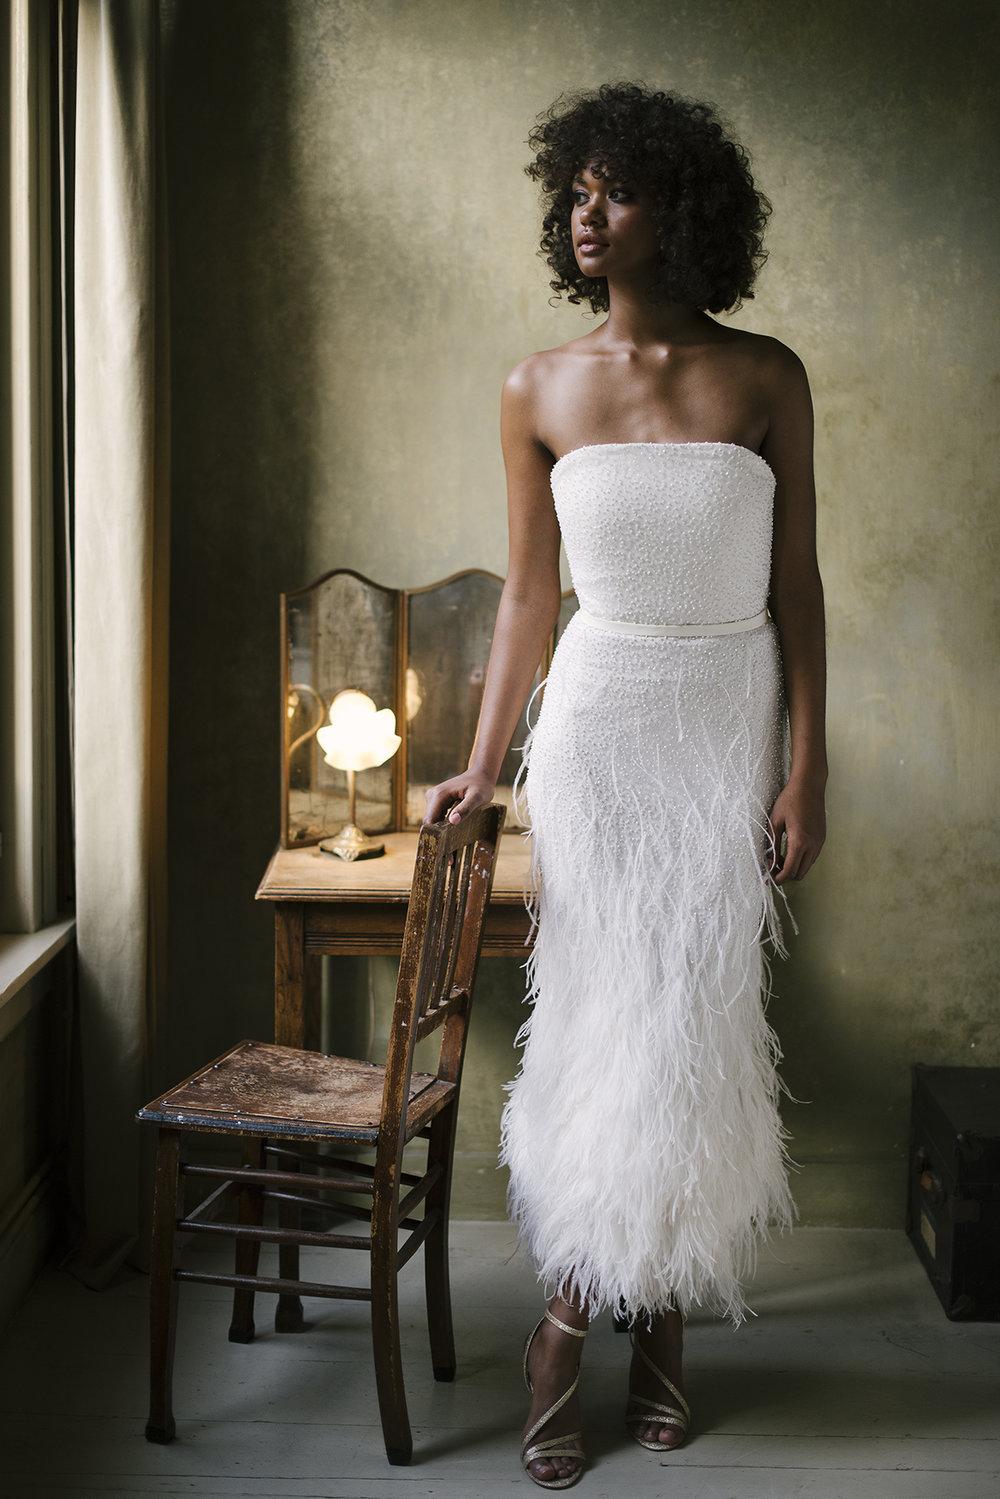 valentine-avoh-robe-mariee-ginger-wedding-dress-bruxelles-photo-elodie-timmermans-37.jpg